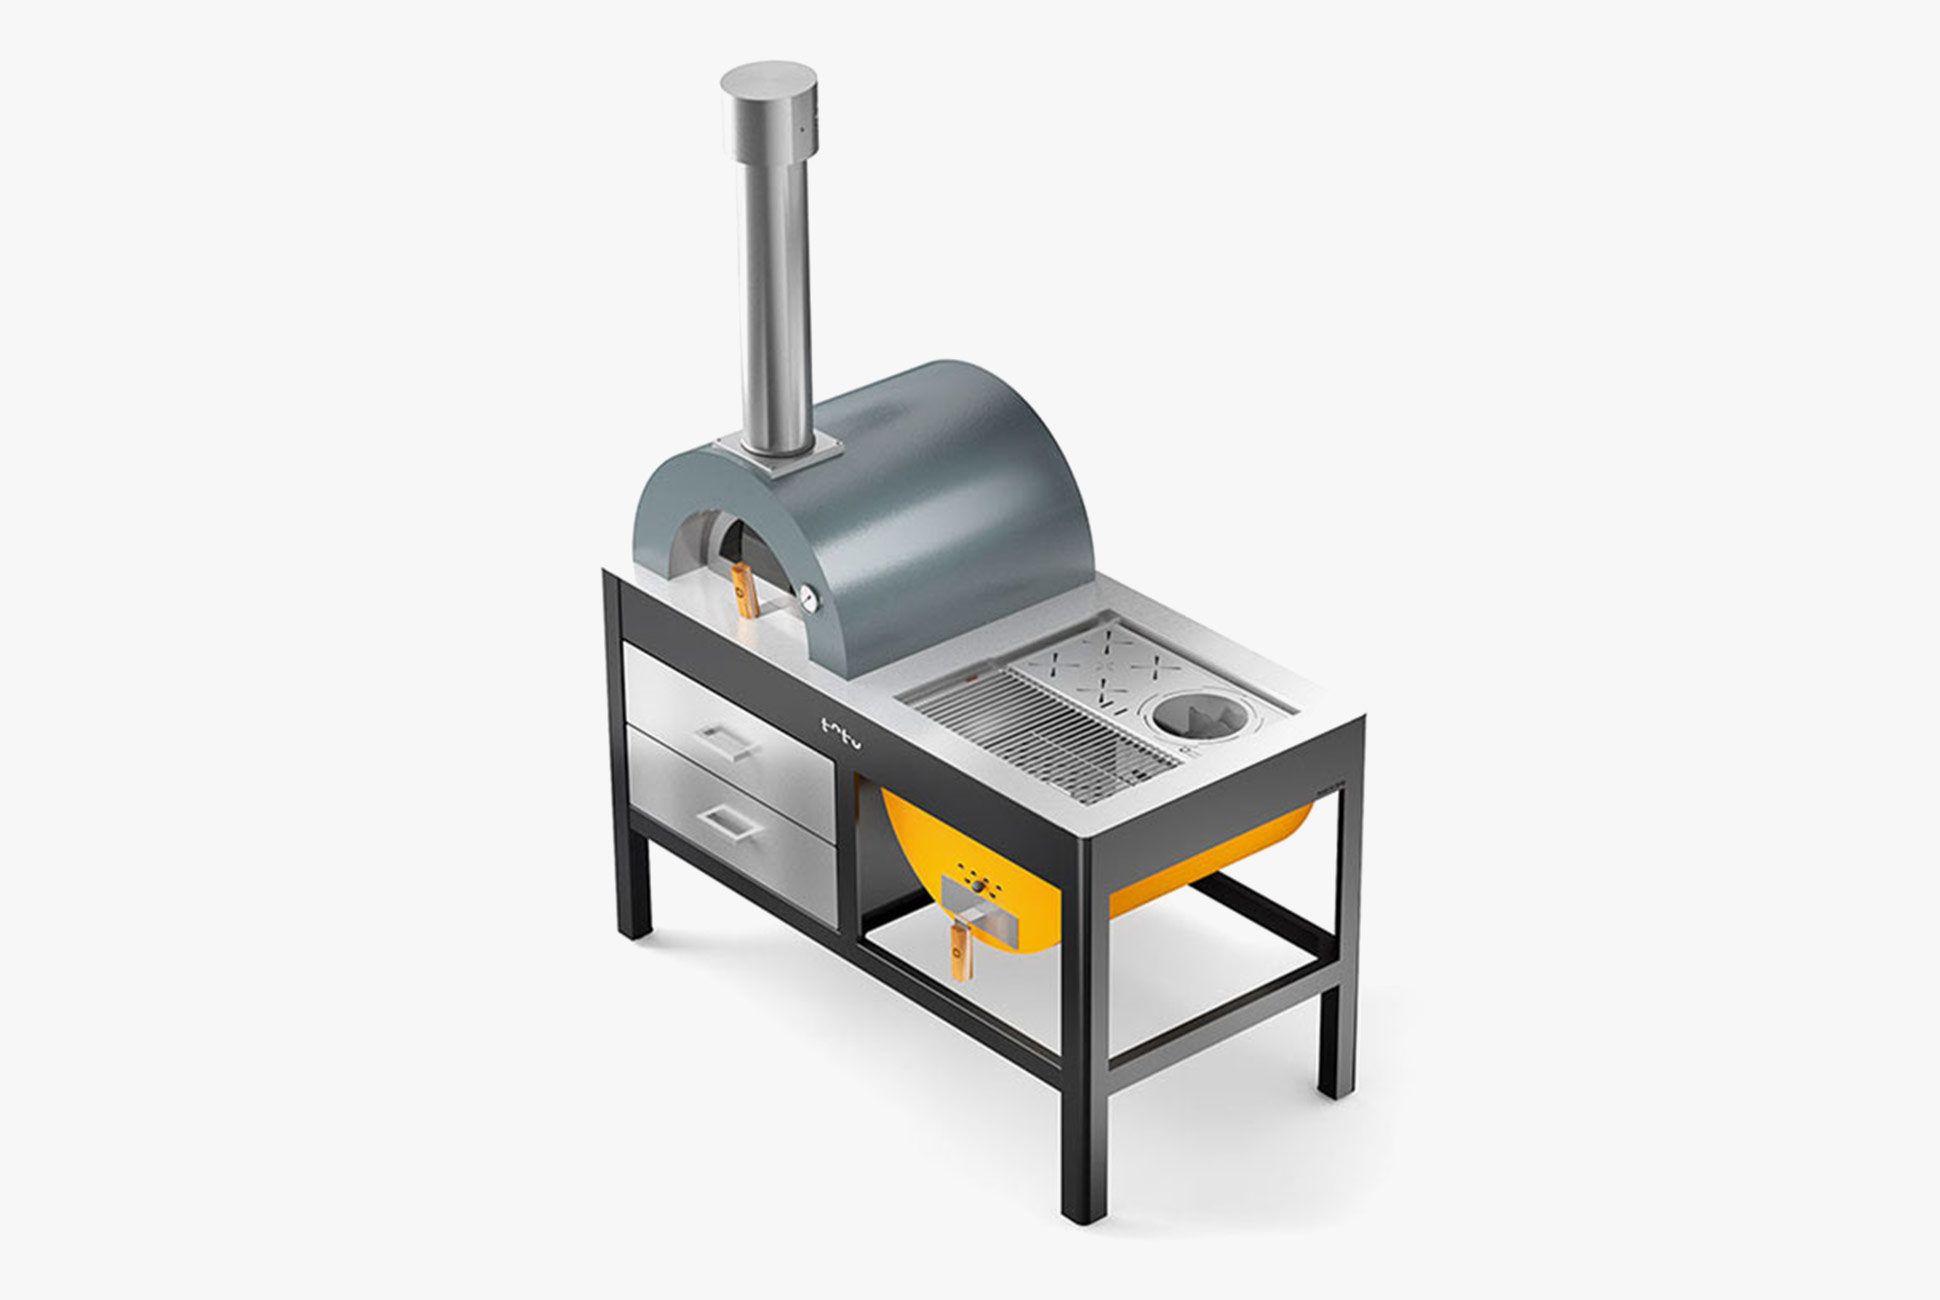 Toto-Grill-Oven-Gear-Patrol-Slide-5